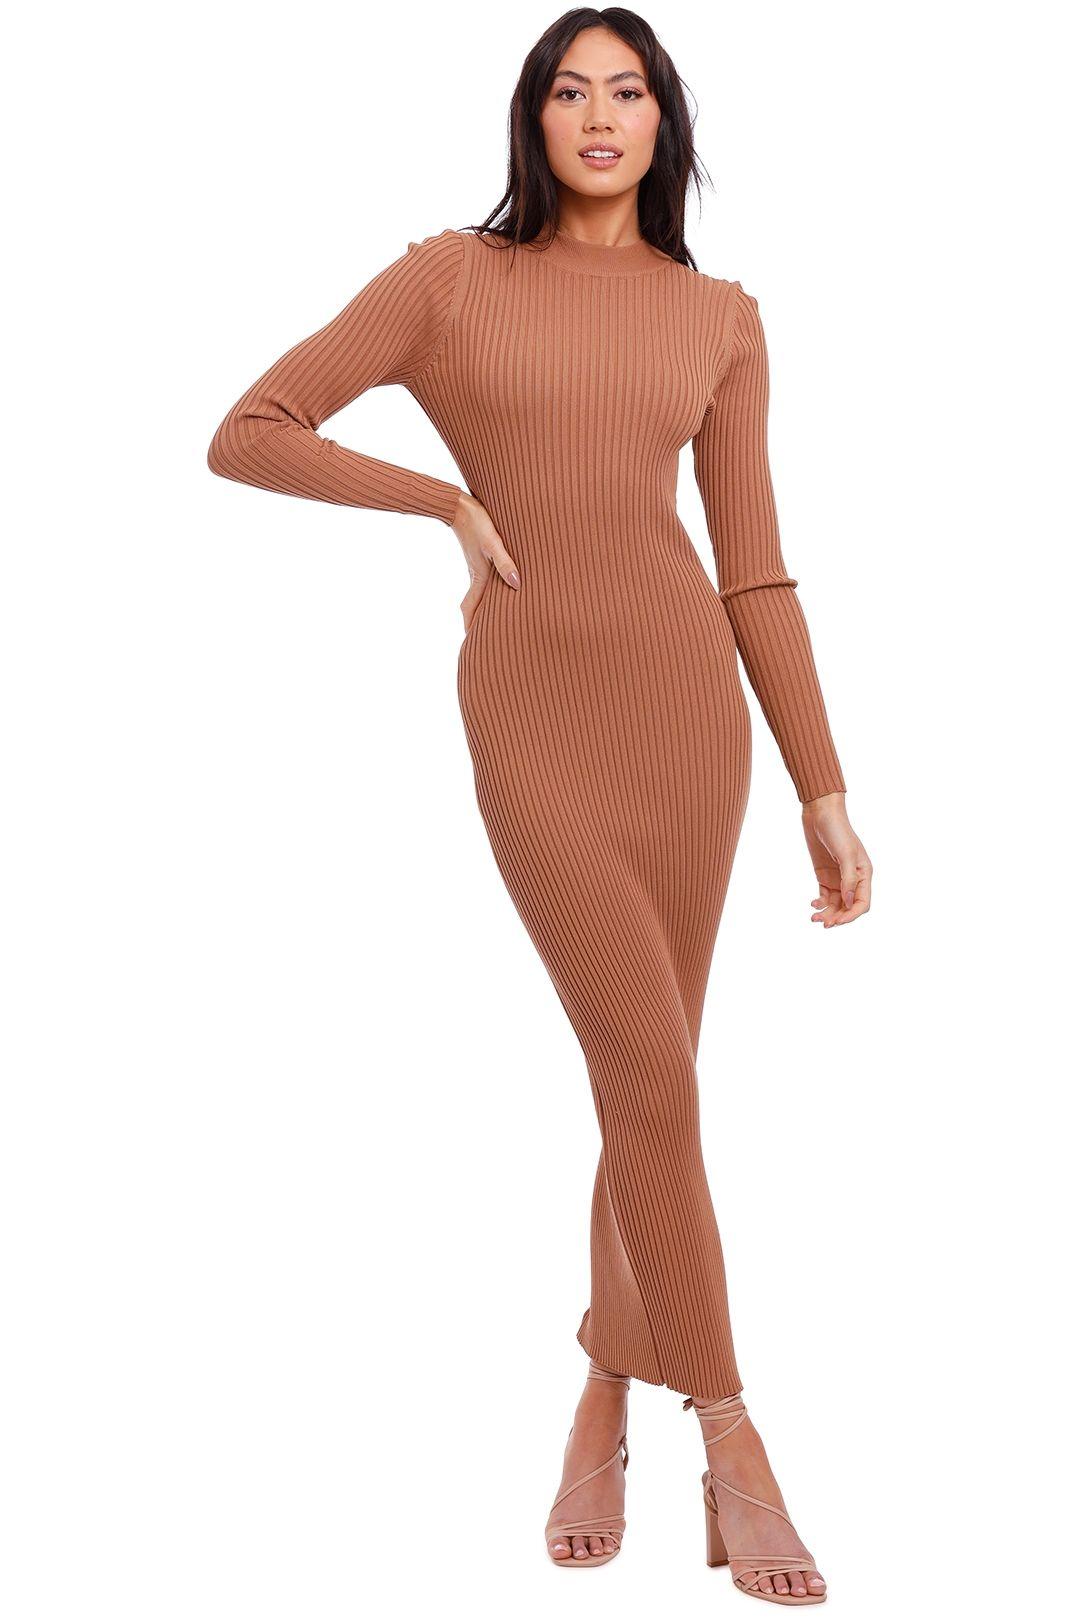 Charlie Holiday Violet Midi Dress Chocolate cutout